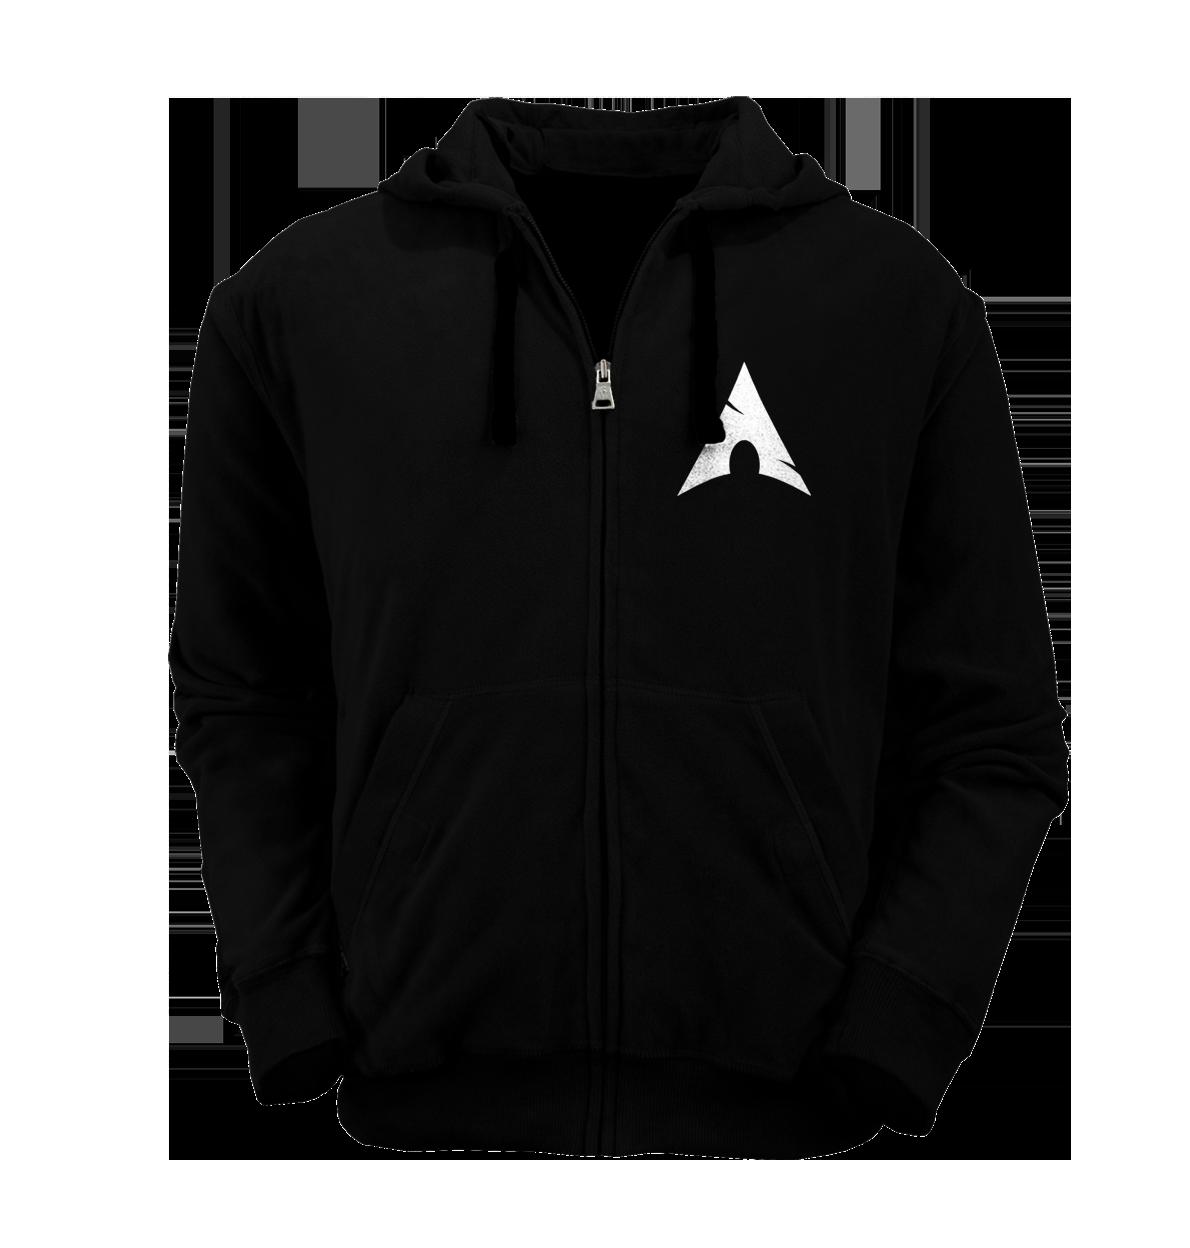 [PRE ORDER] Hoodie Zipper Arch Linux 1